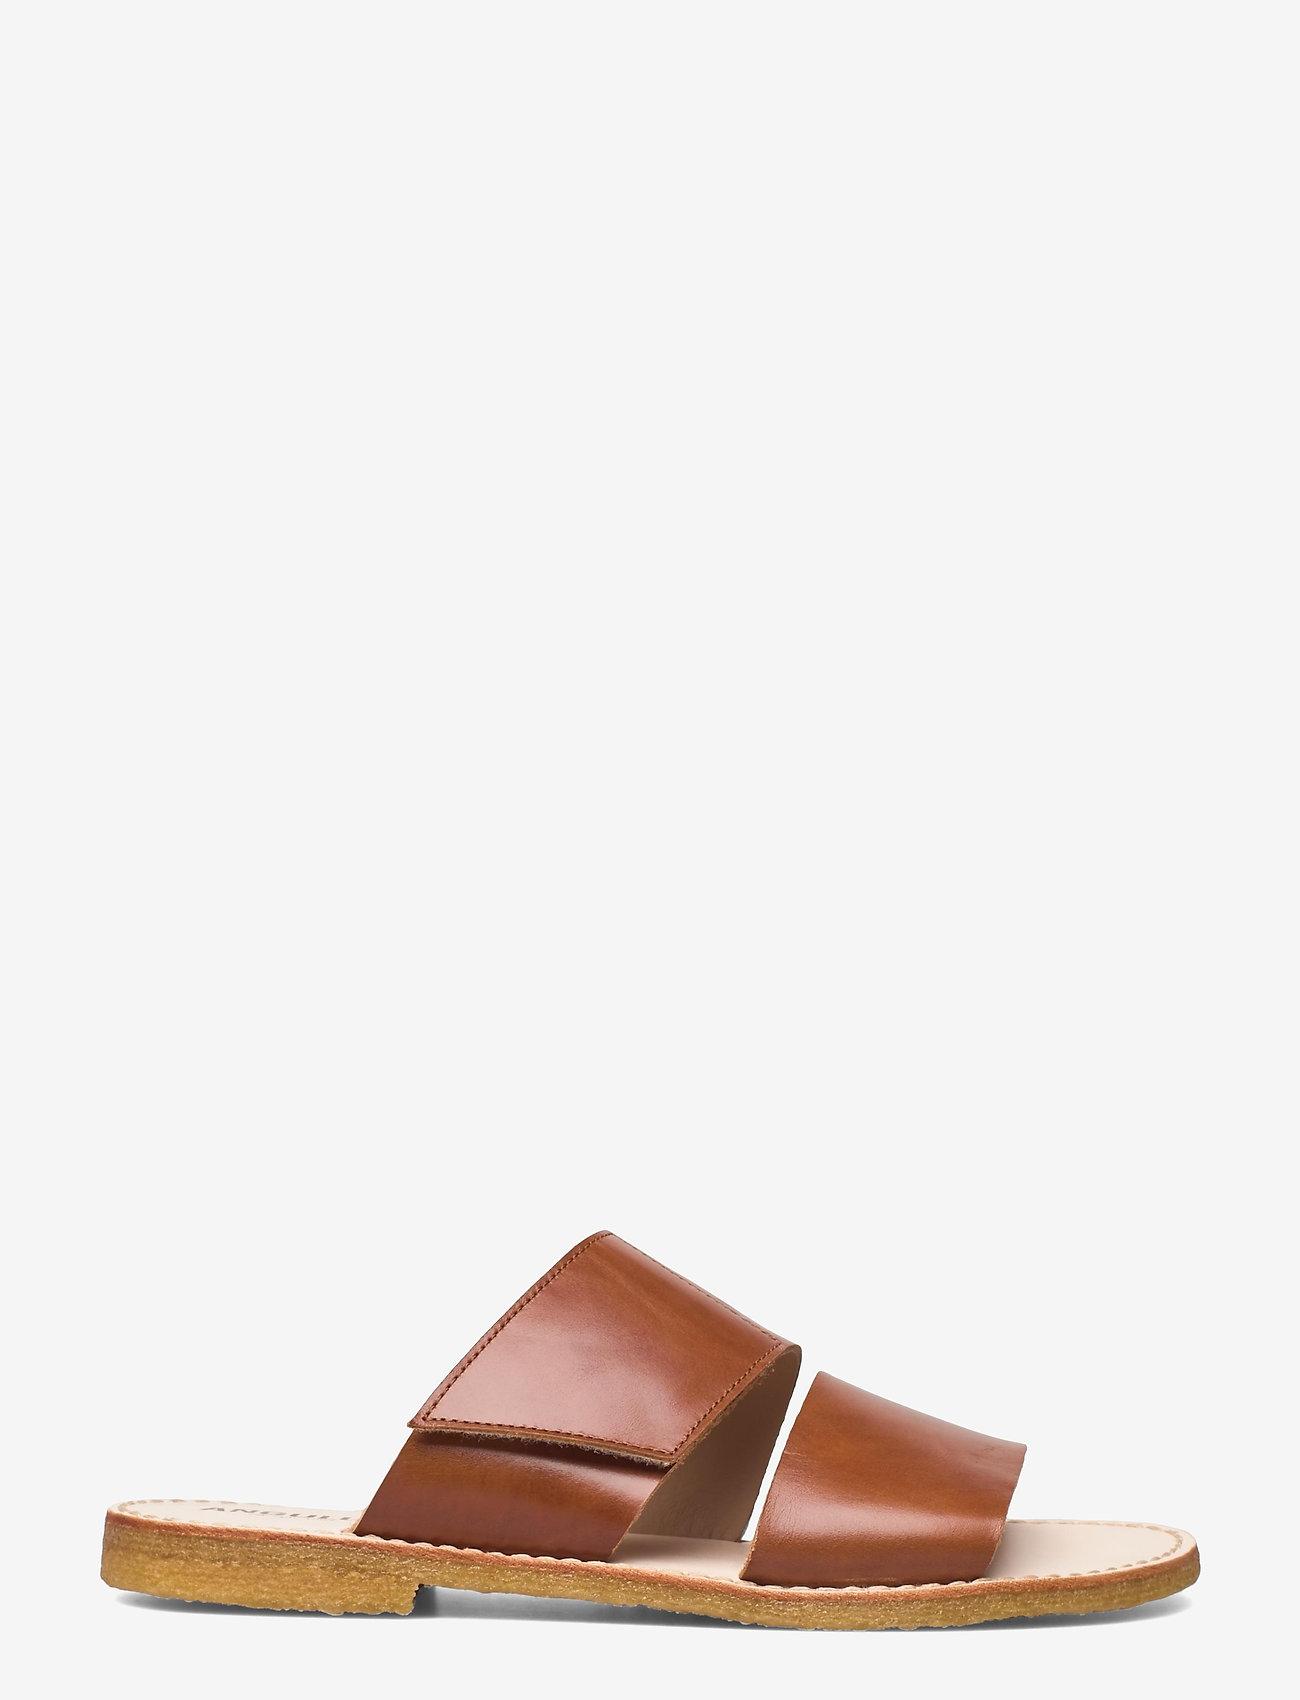 ANGULUS - Sandals - flat - open toe - op - flache sandalen - 1838 cognac - 1